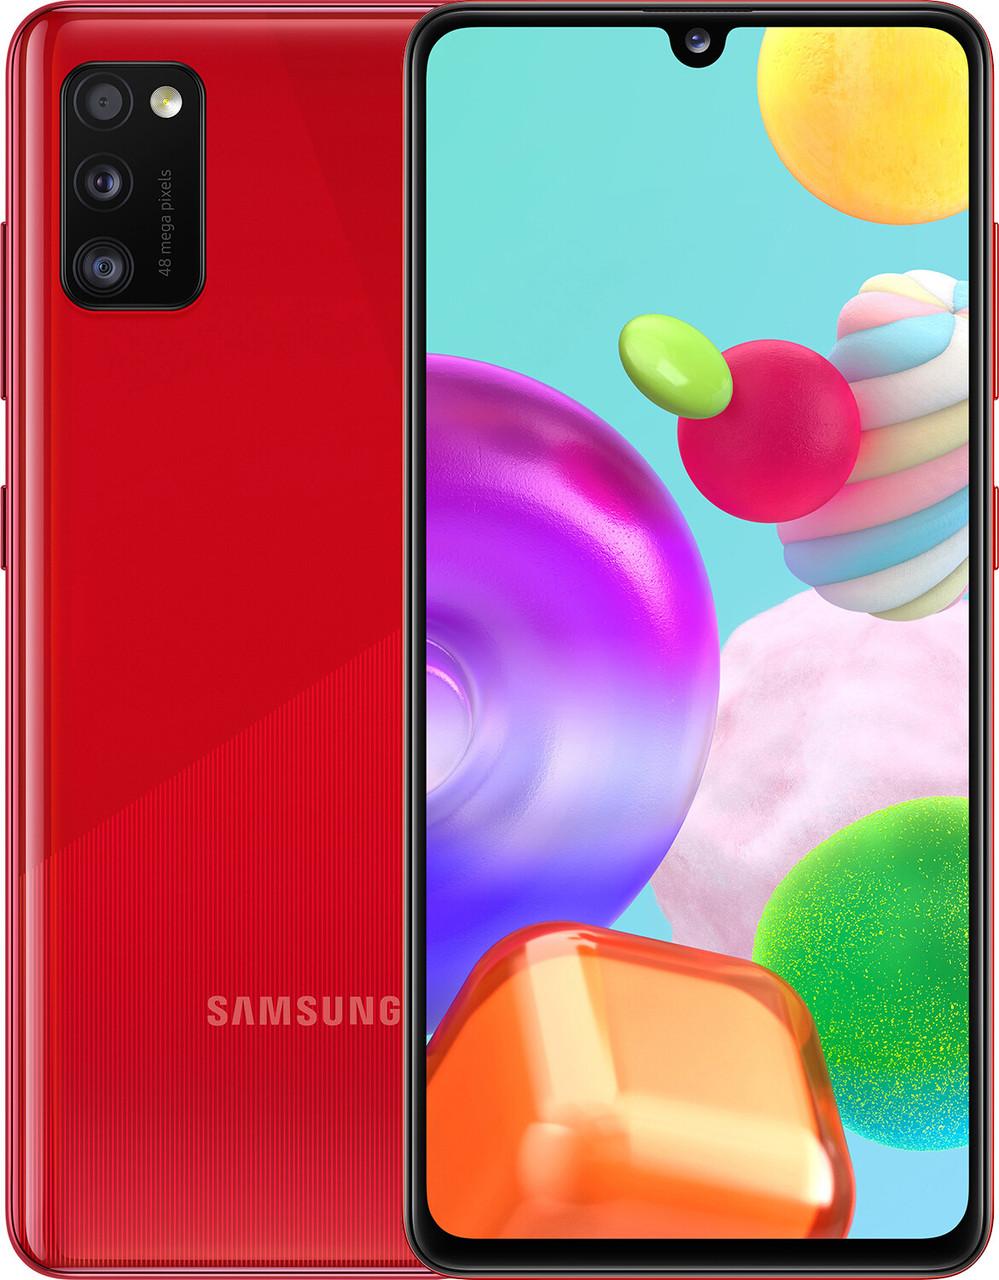 Смартфон Samsung Galaxy A41 4/64GB Red(SM-A415FZRDSEK)